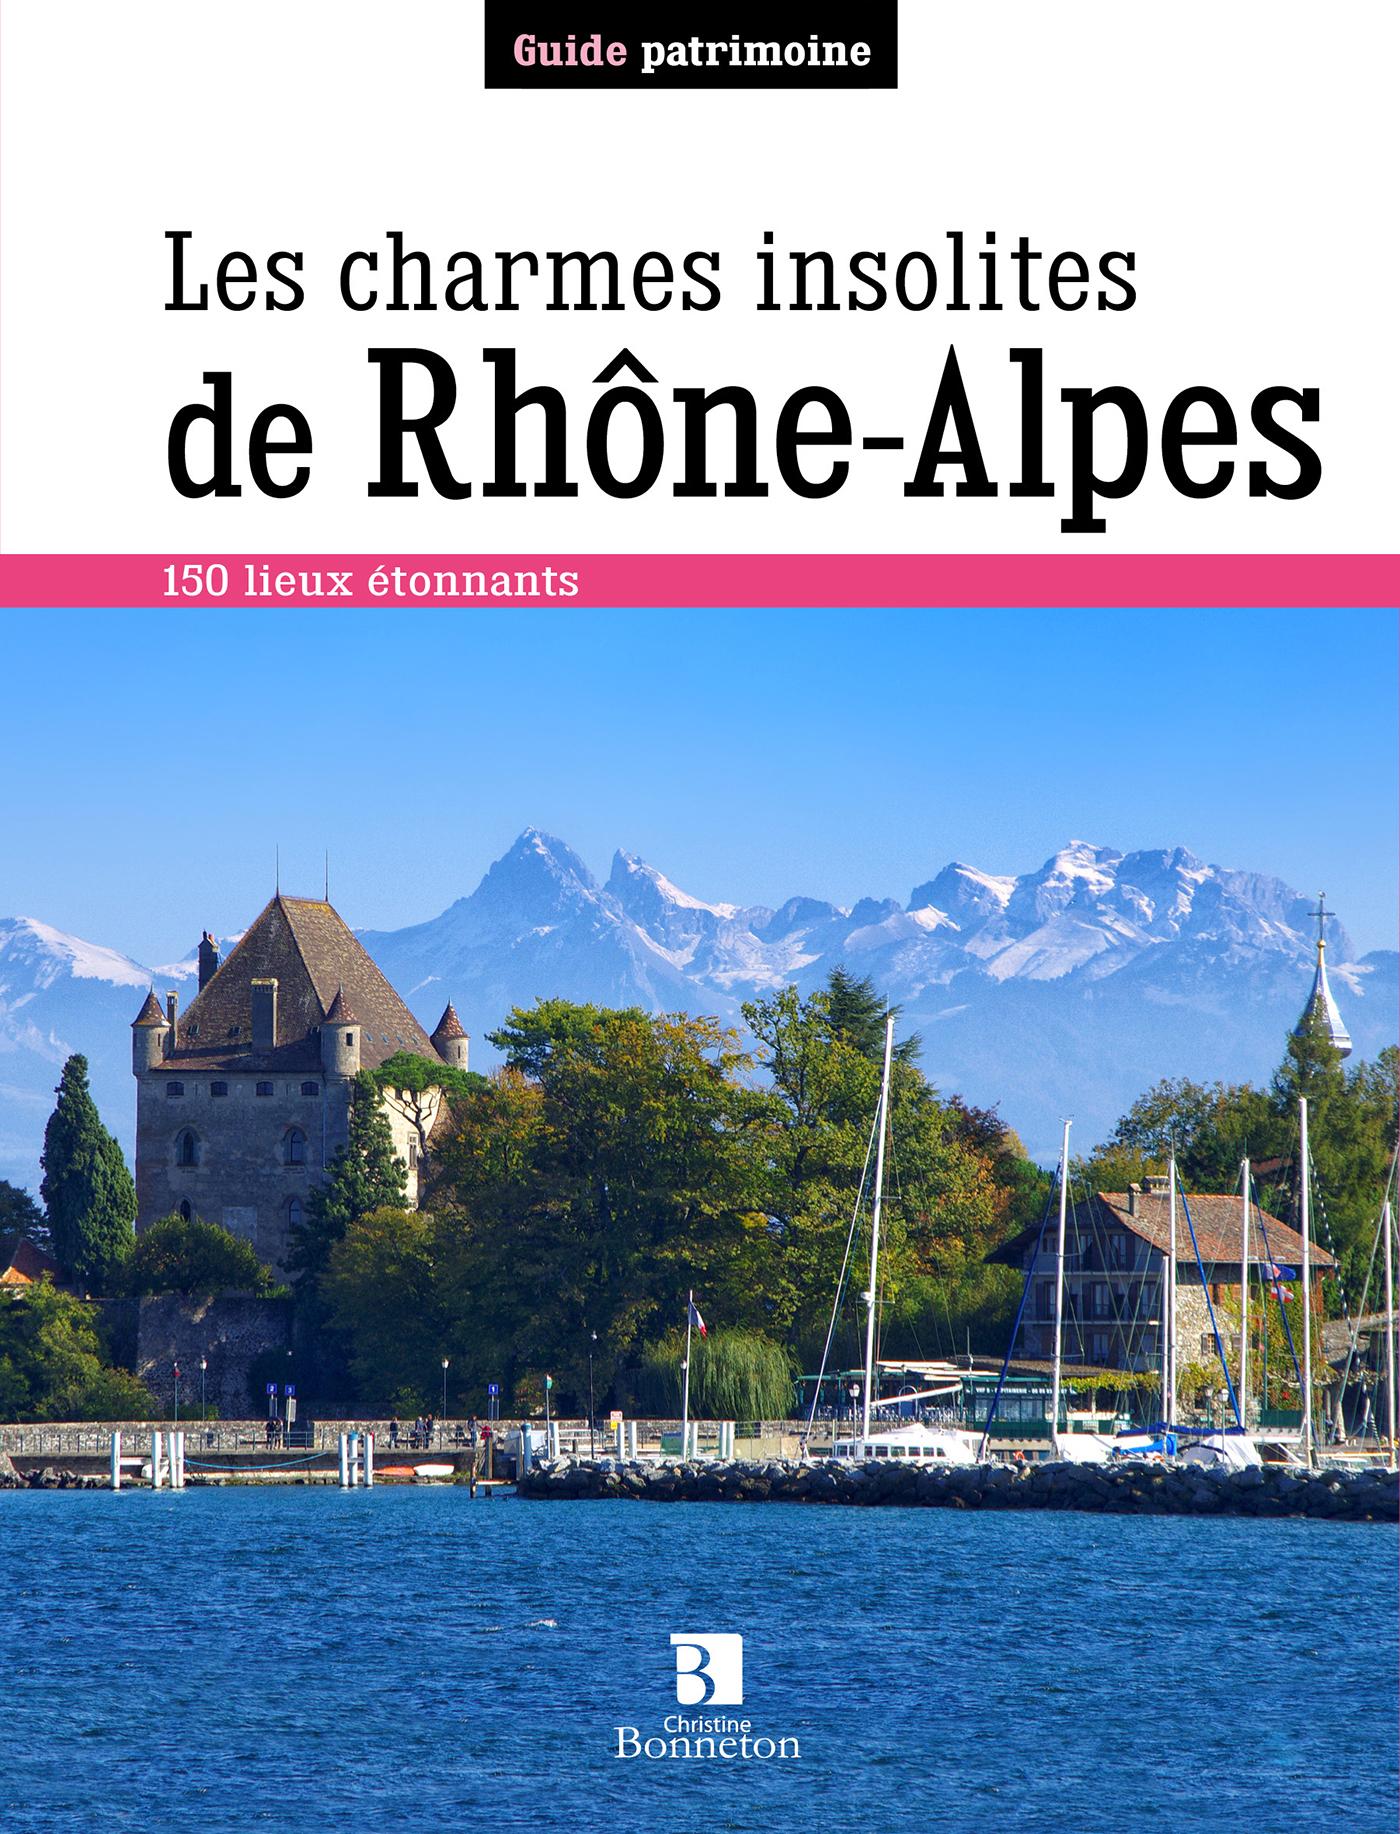 CHARMES INSOLITES DE RHONE-ALPES (LES)